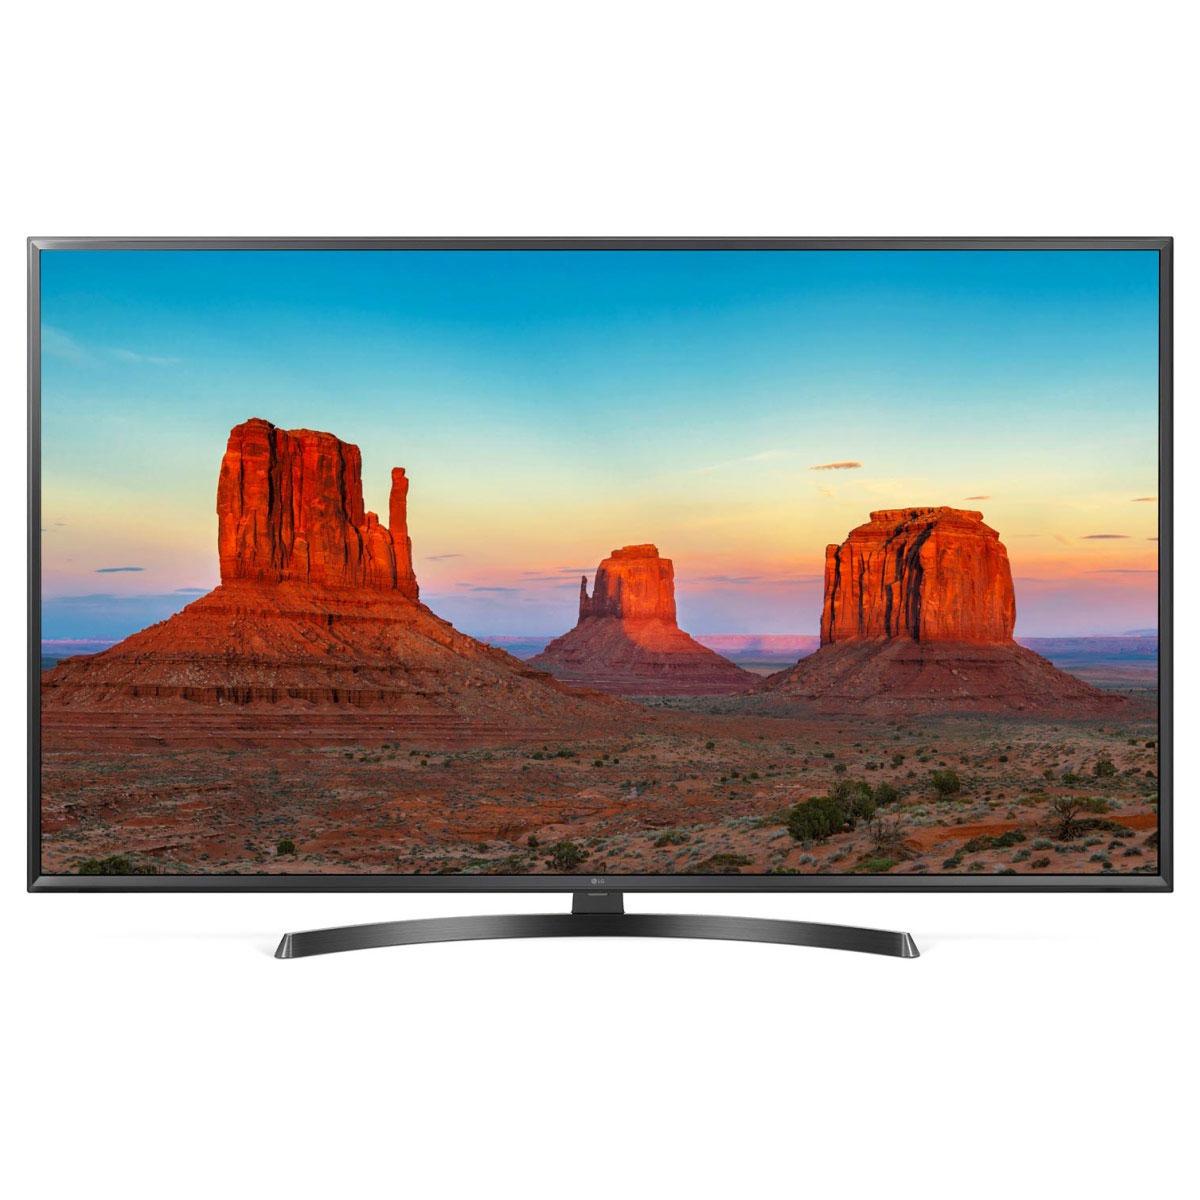 "TV LG 43UK6470 Téléviseur LED 4K 43"" (109 cm) 16/9 - 3840 x 2160 pixels - Ultra HD 2160p - HDR - Wi-Fi - Bluetooth - 1600 Hz"